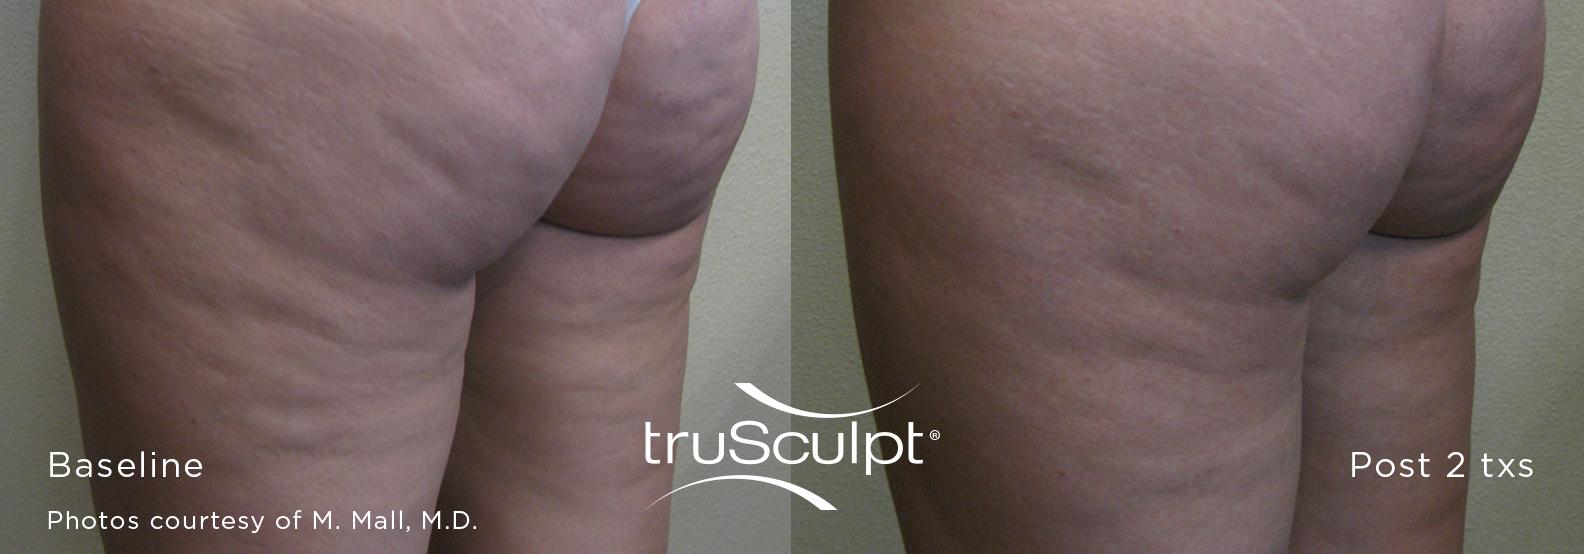 truSculpt_Cellulite_1